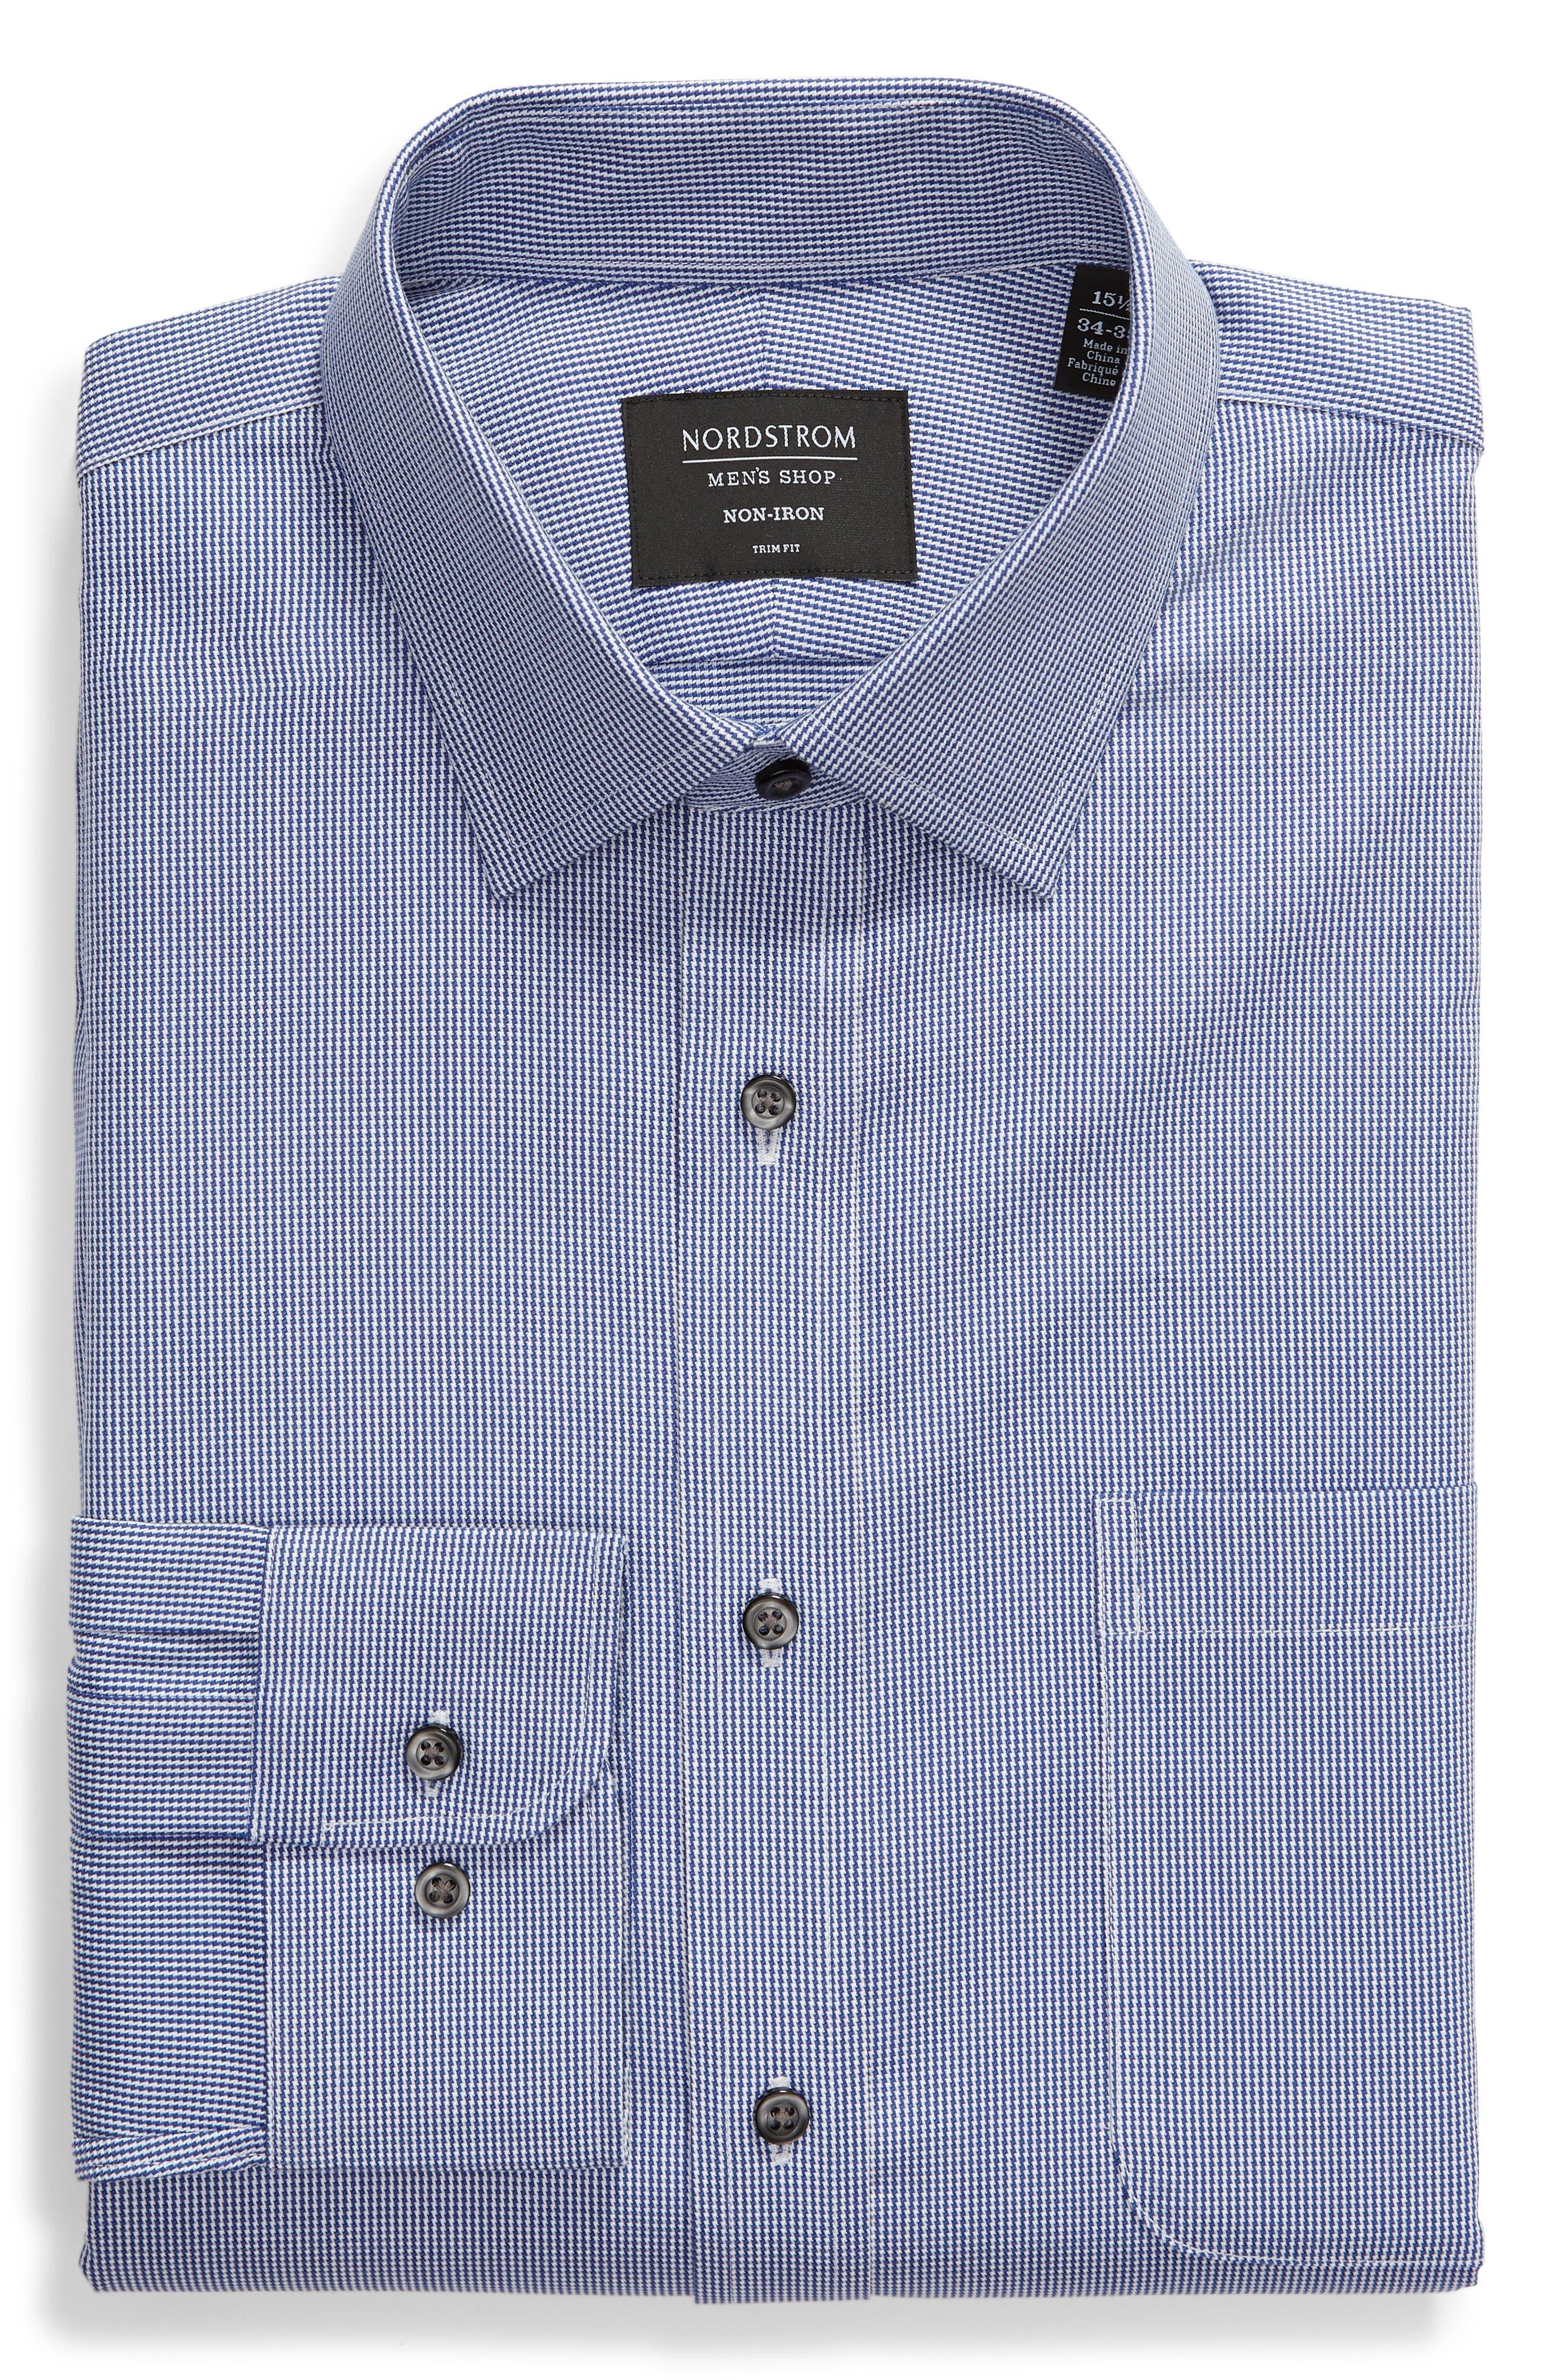 Trim Fit Non-Iron Solid Dress Shirt,                             Alternate thumbnail 5, color,                             NAVY DRESS